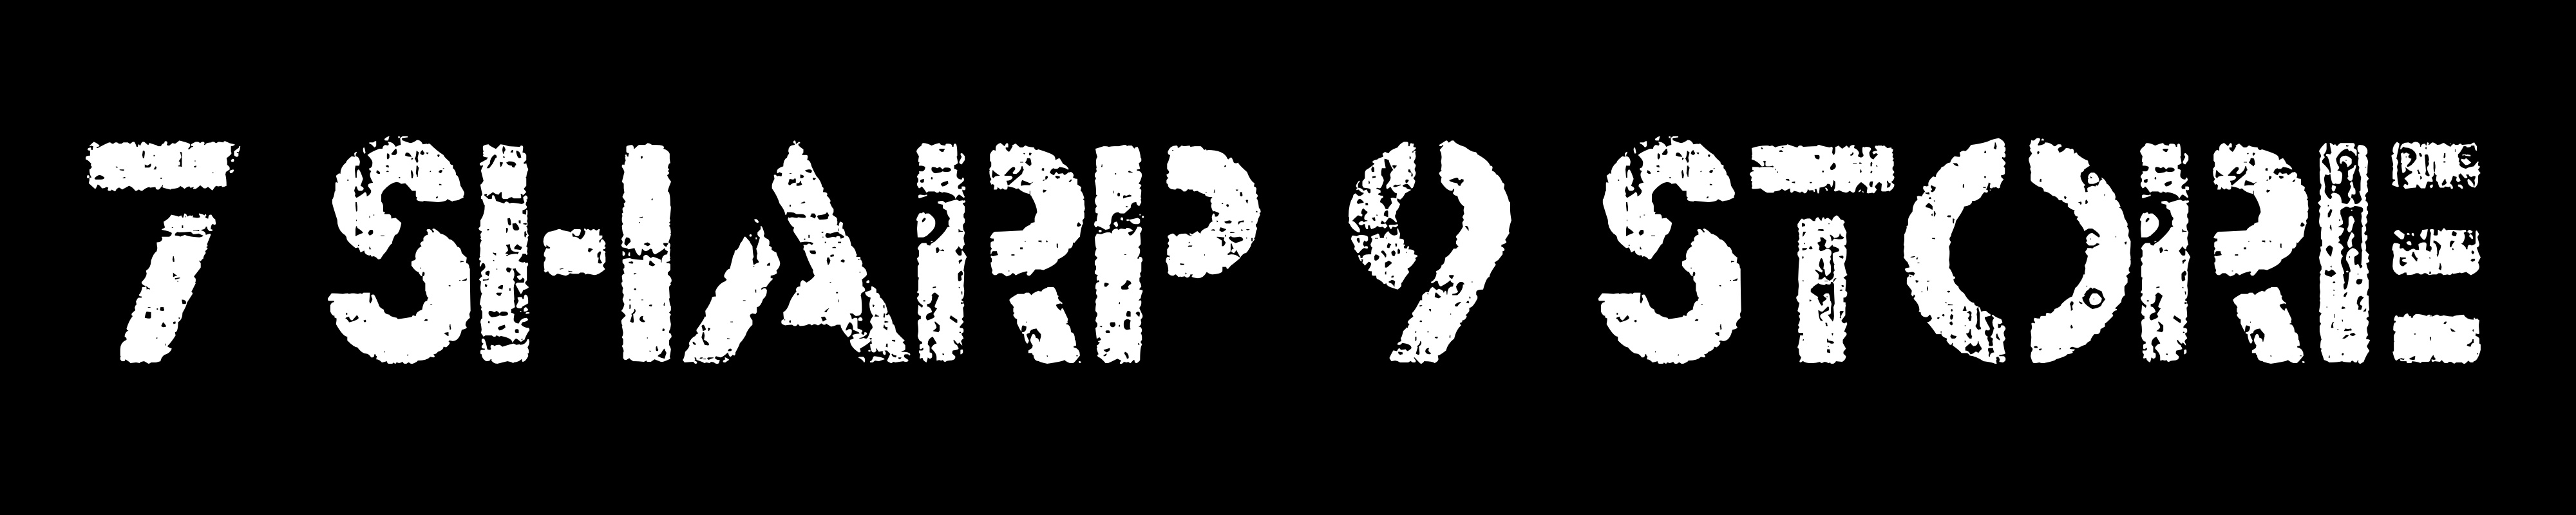 7sharp9 Cover